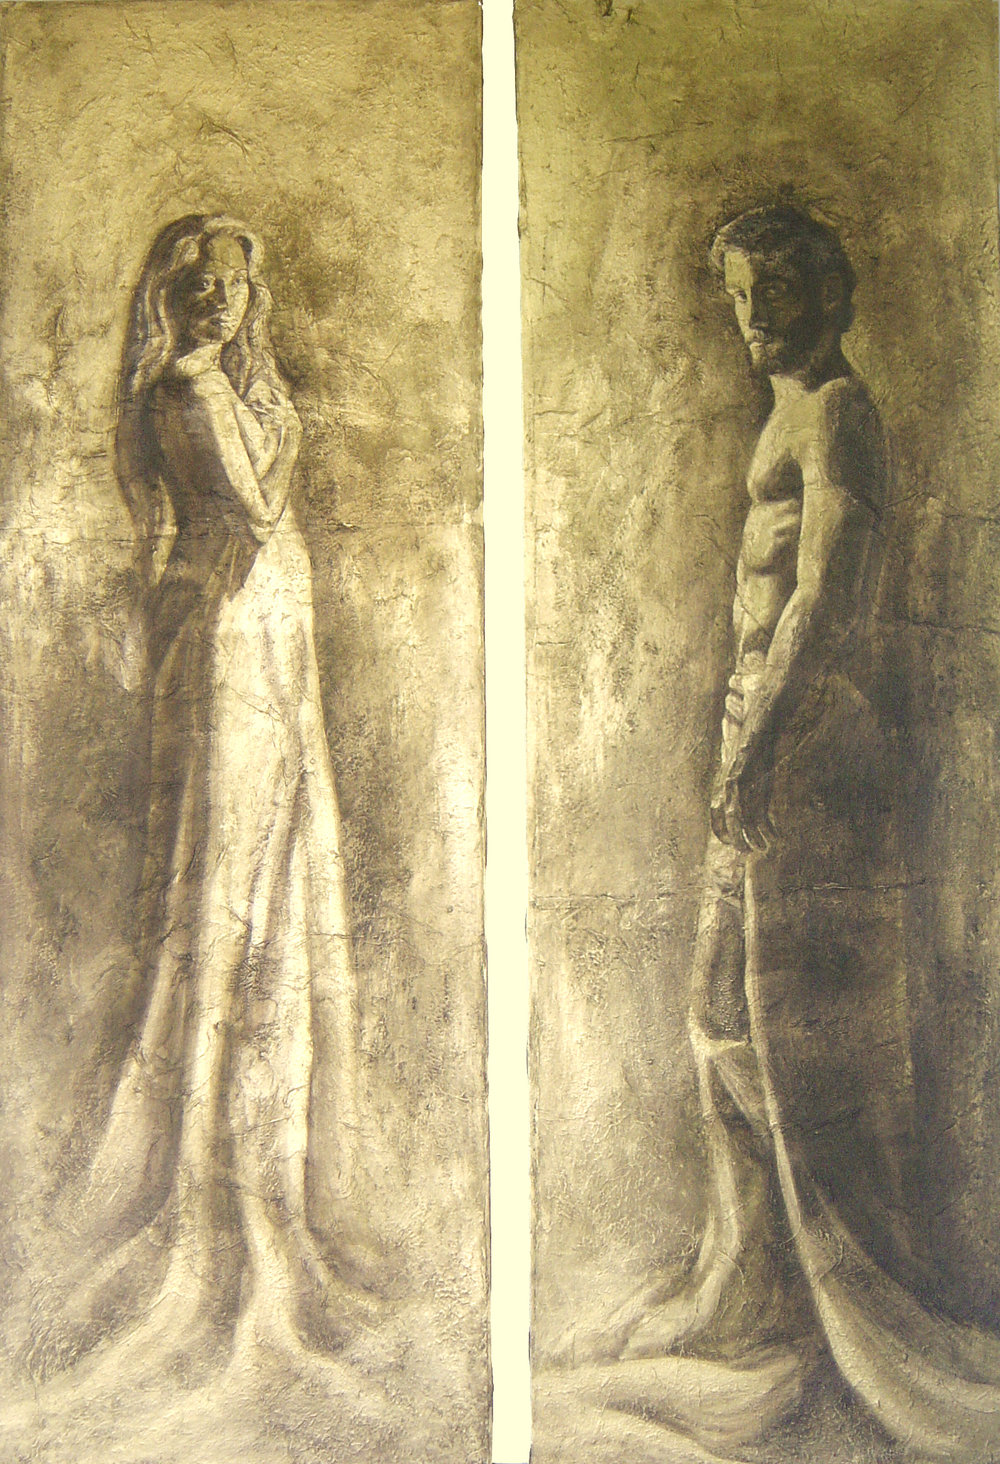 Diptych-Aphrodite & Adonis-{2x(150x50)cm}.jpg